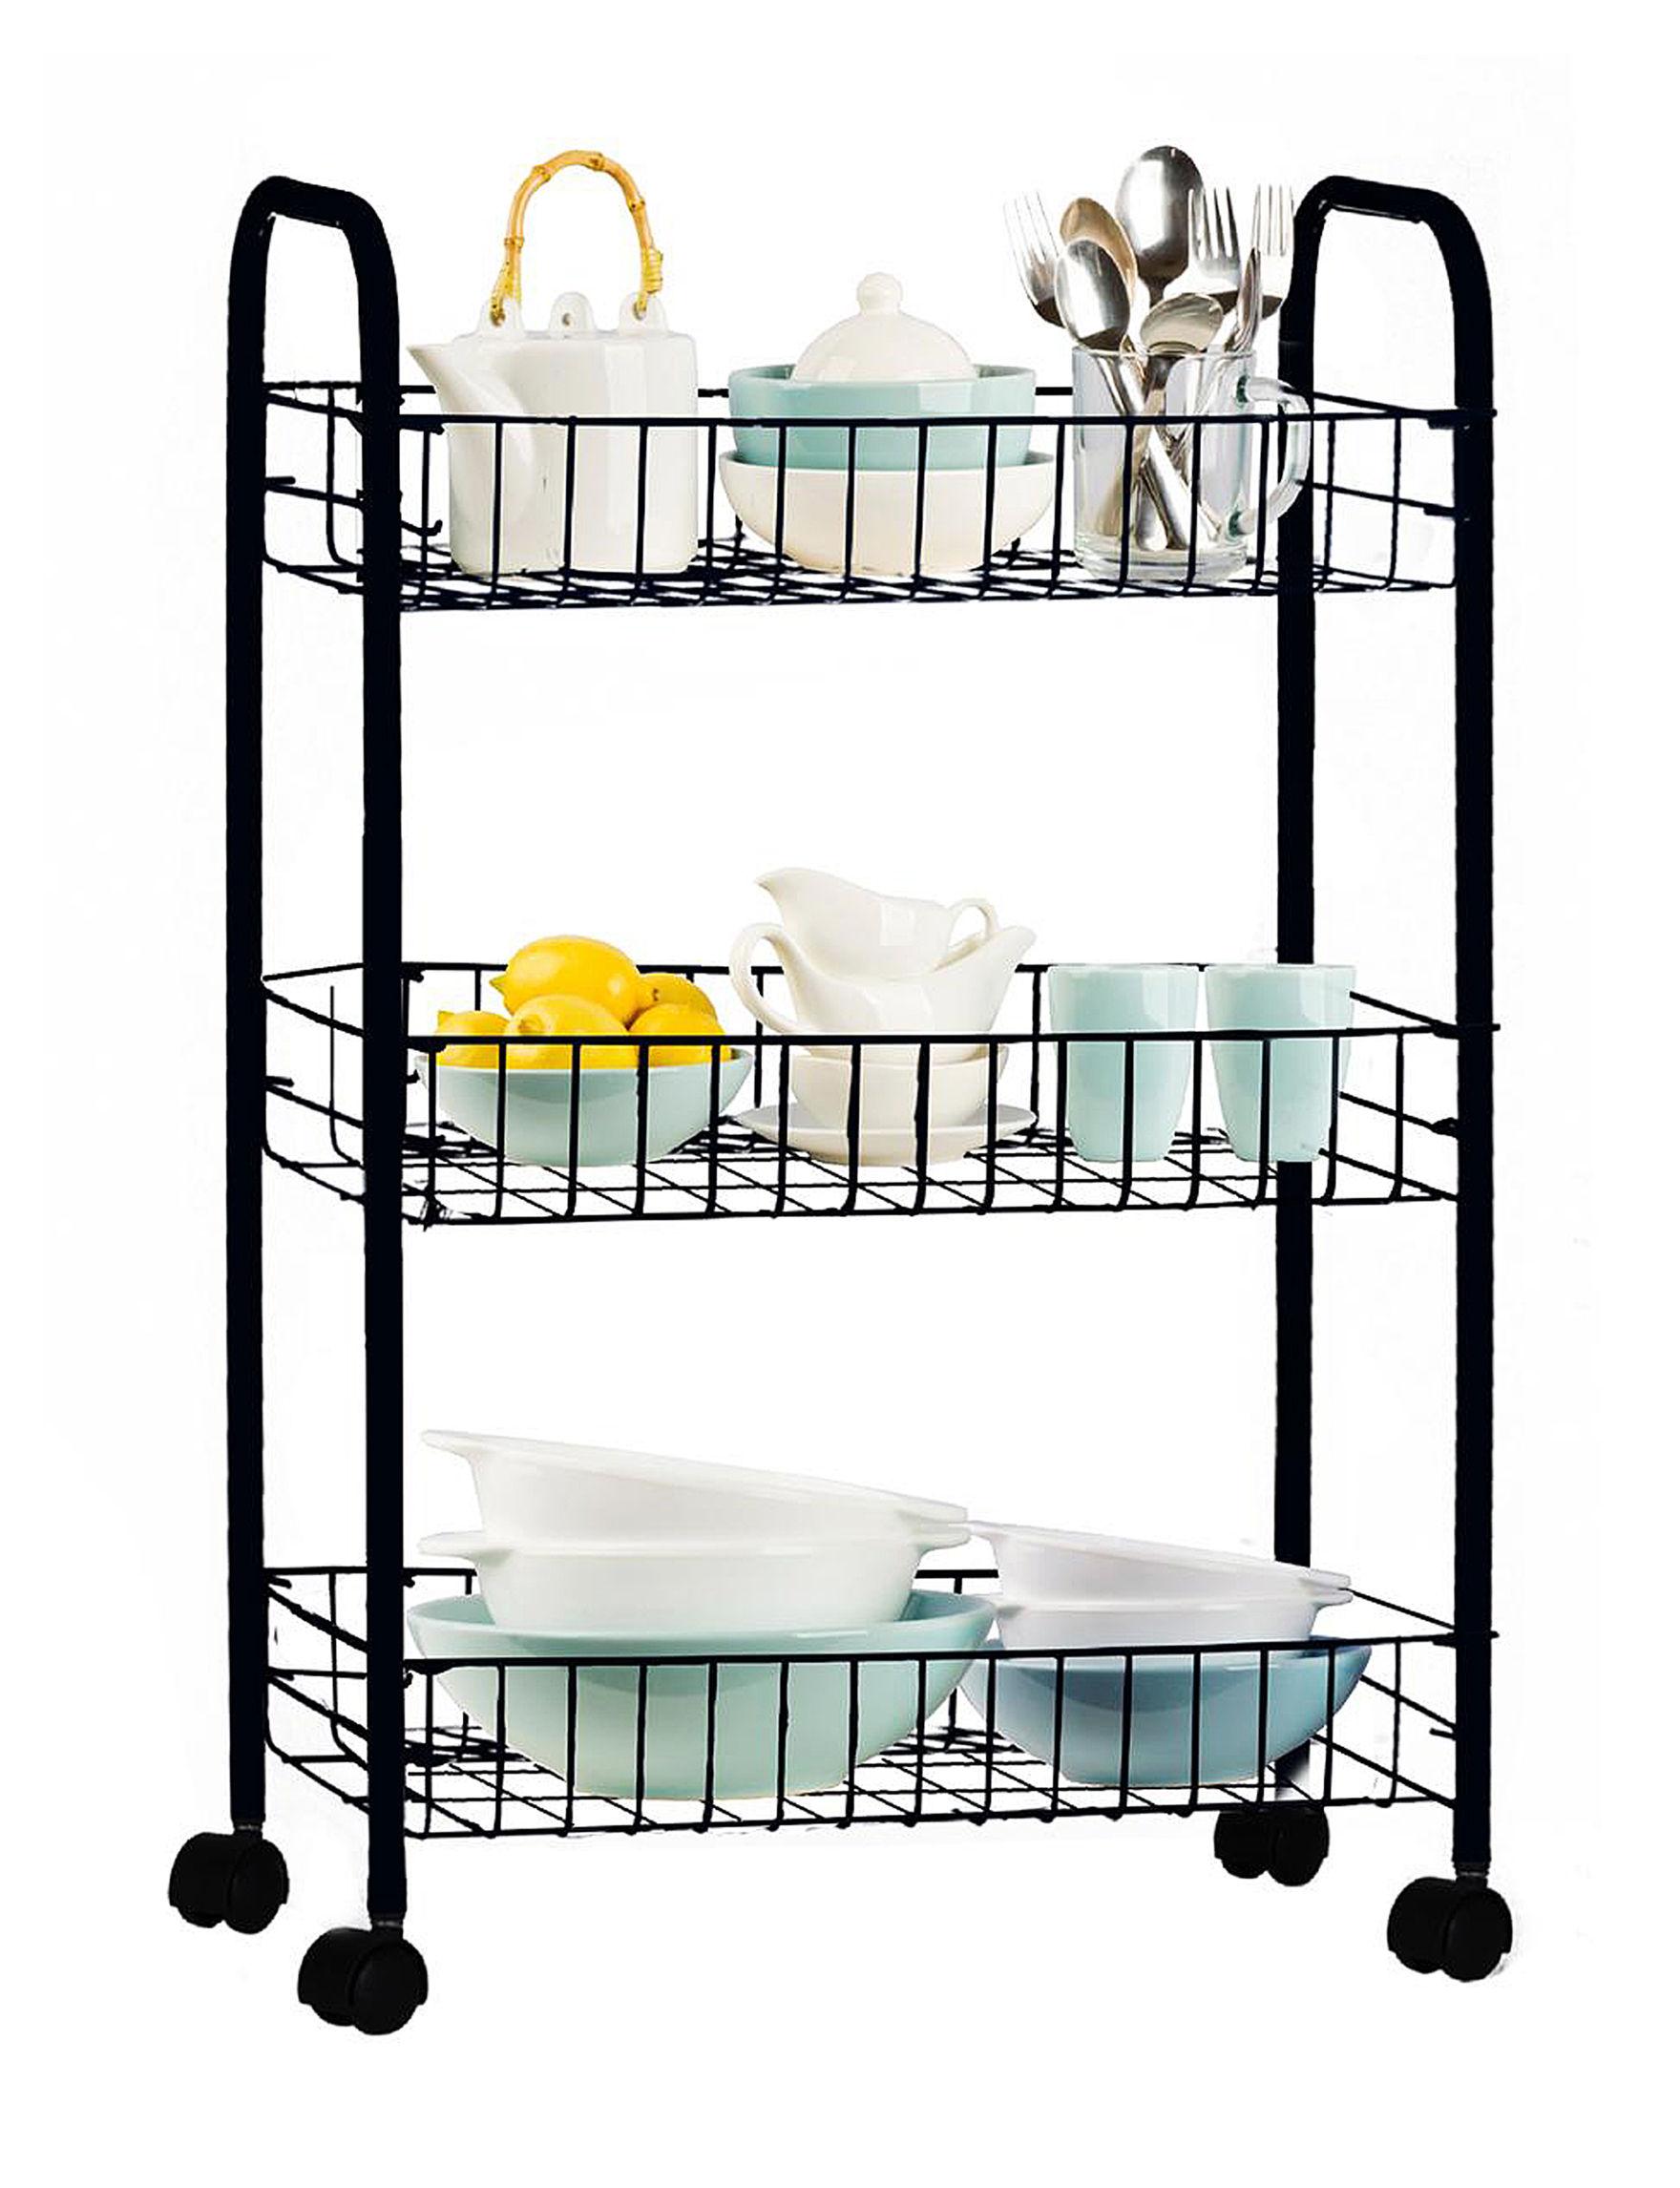 Farberware Black Carts & Drawers Storage & Organization